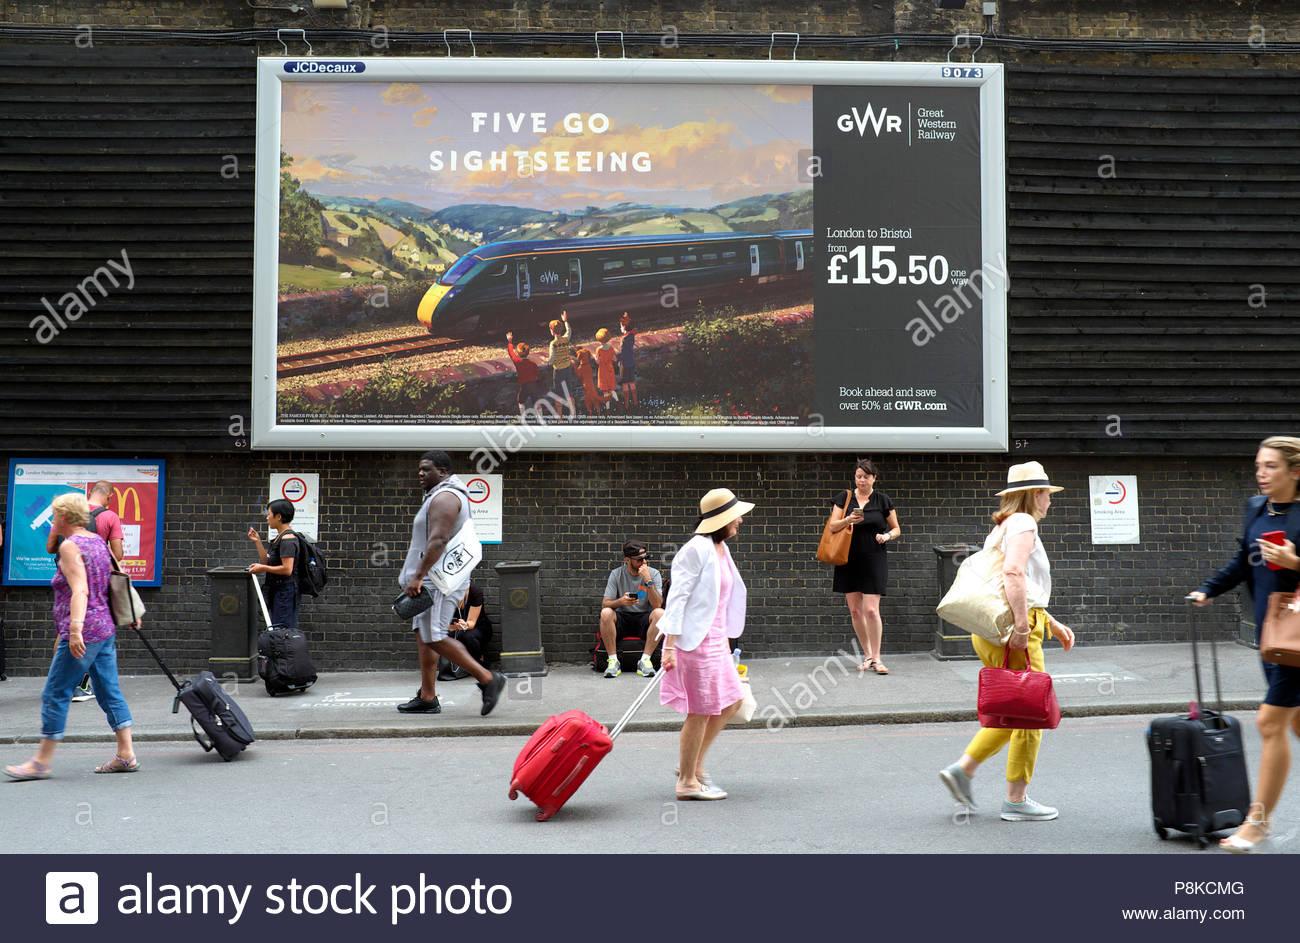 train-travel-rail-journey-advert-for-gwr-passenger-fare-for-london-to-bristol-advertised-london-paddington-station-london-uk-P8KCMG.jpg